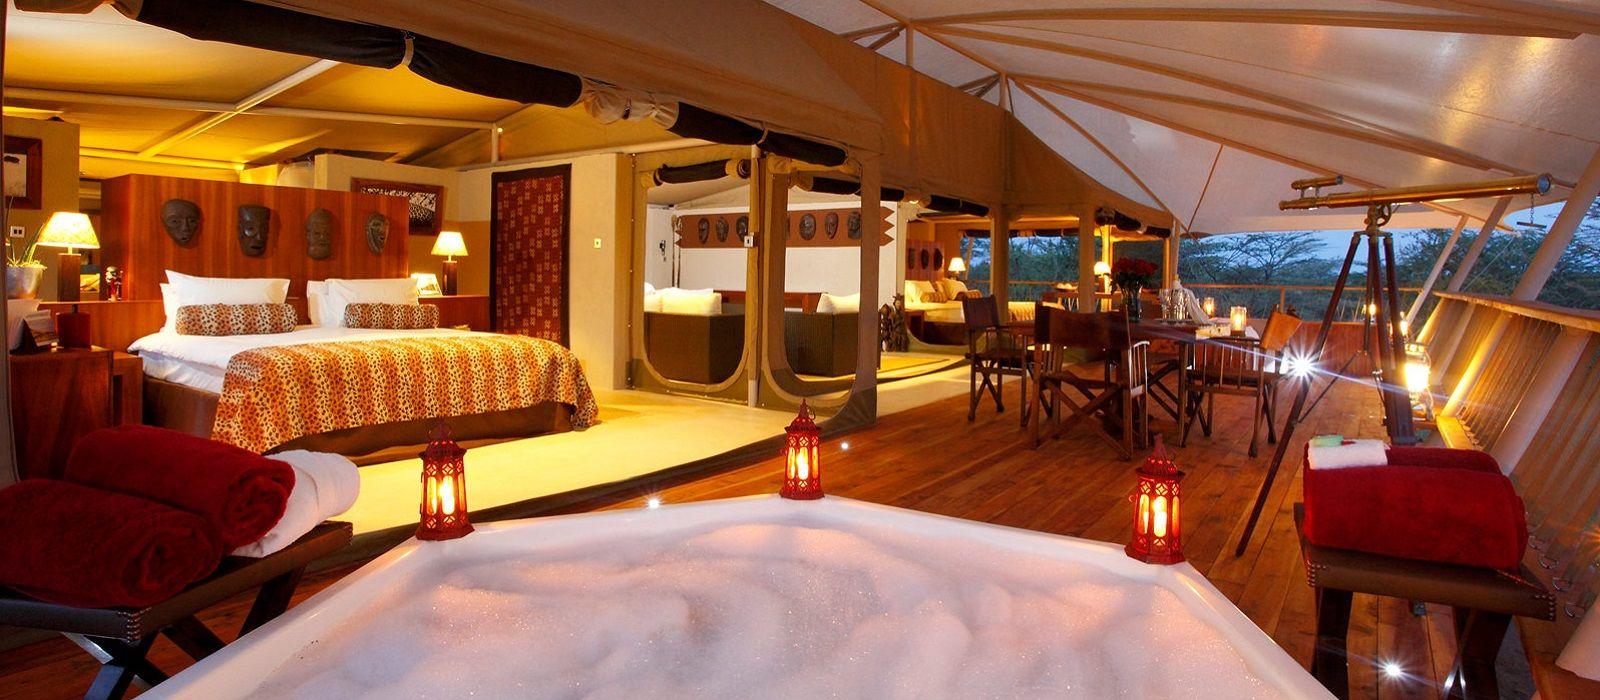 Hotel Mara Bushtops Luxury Tented Camp Kenya